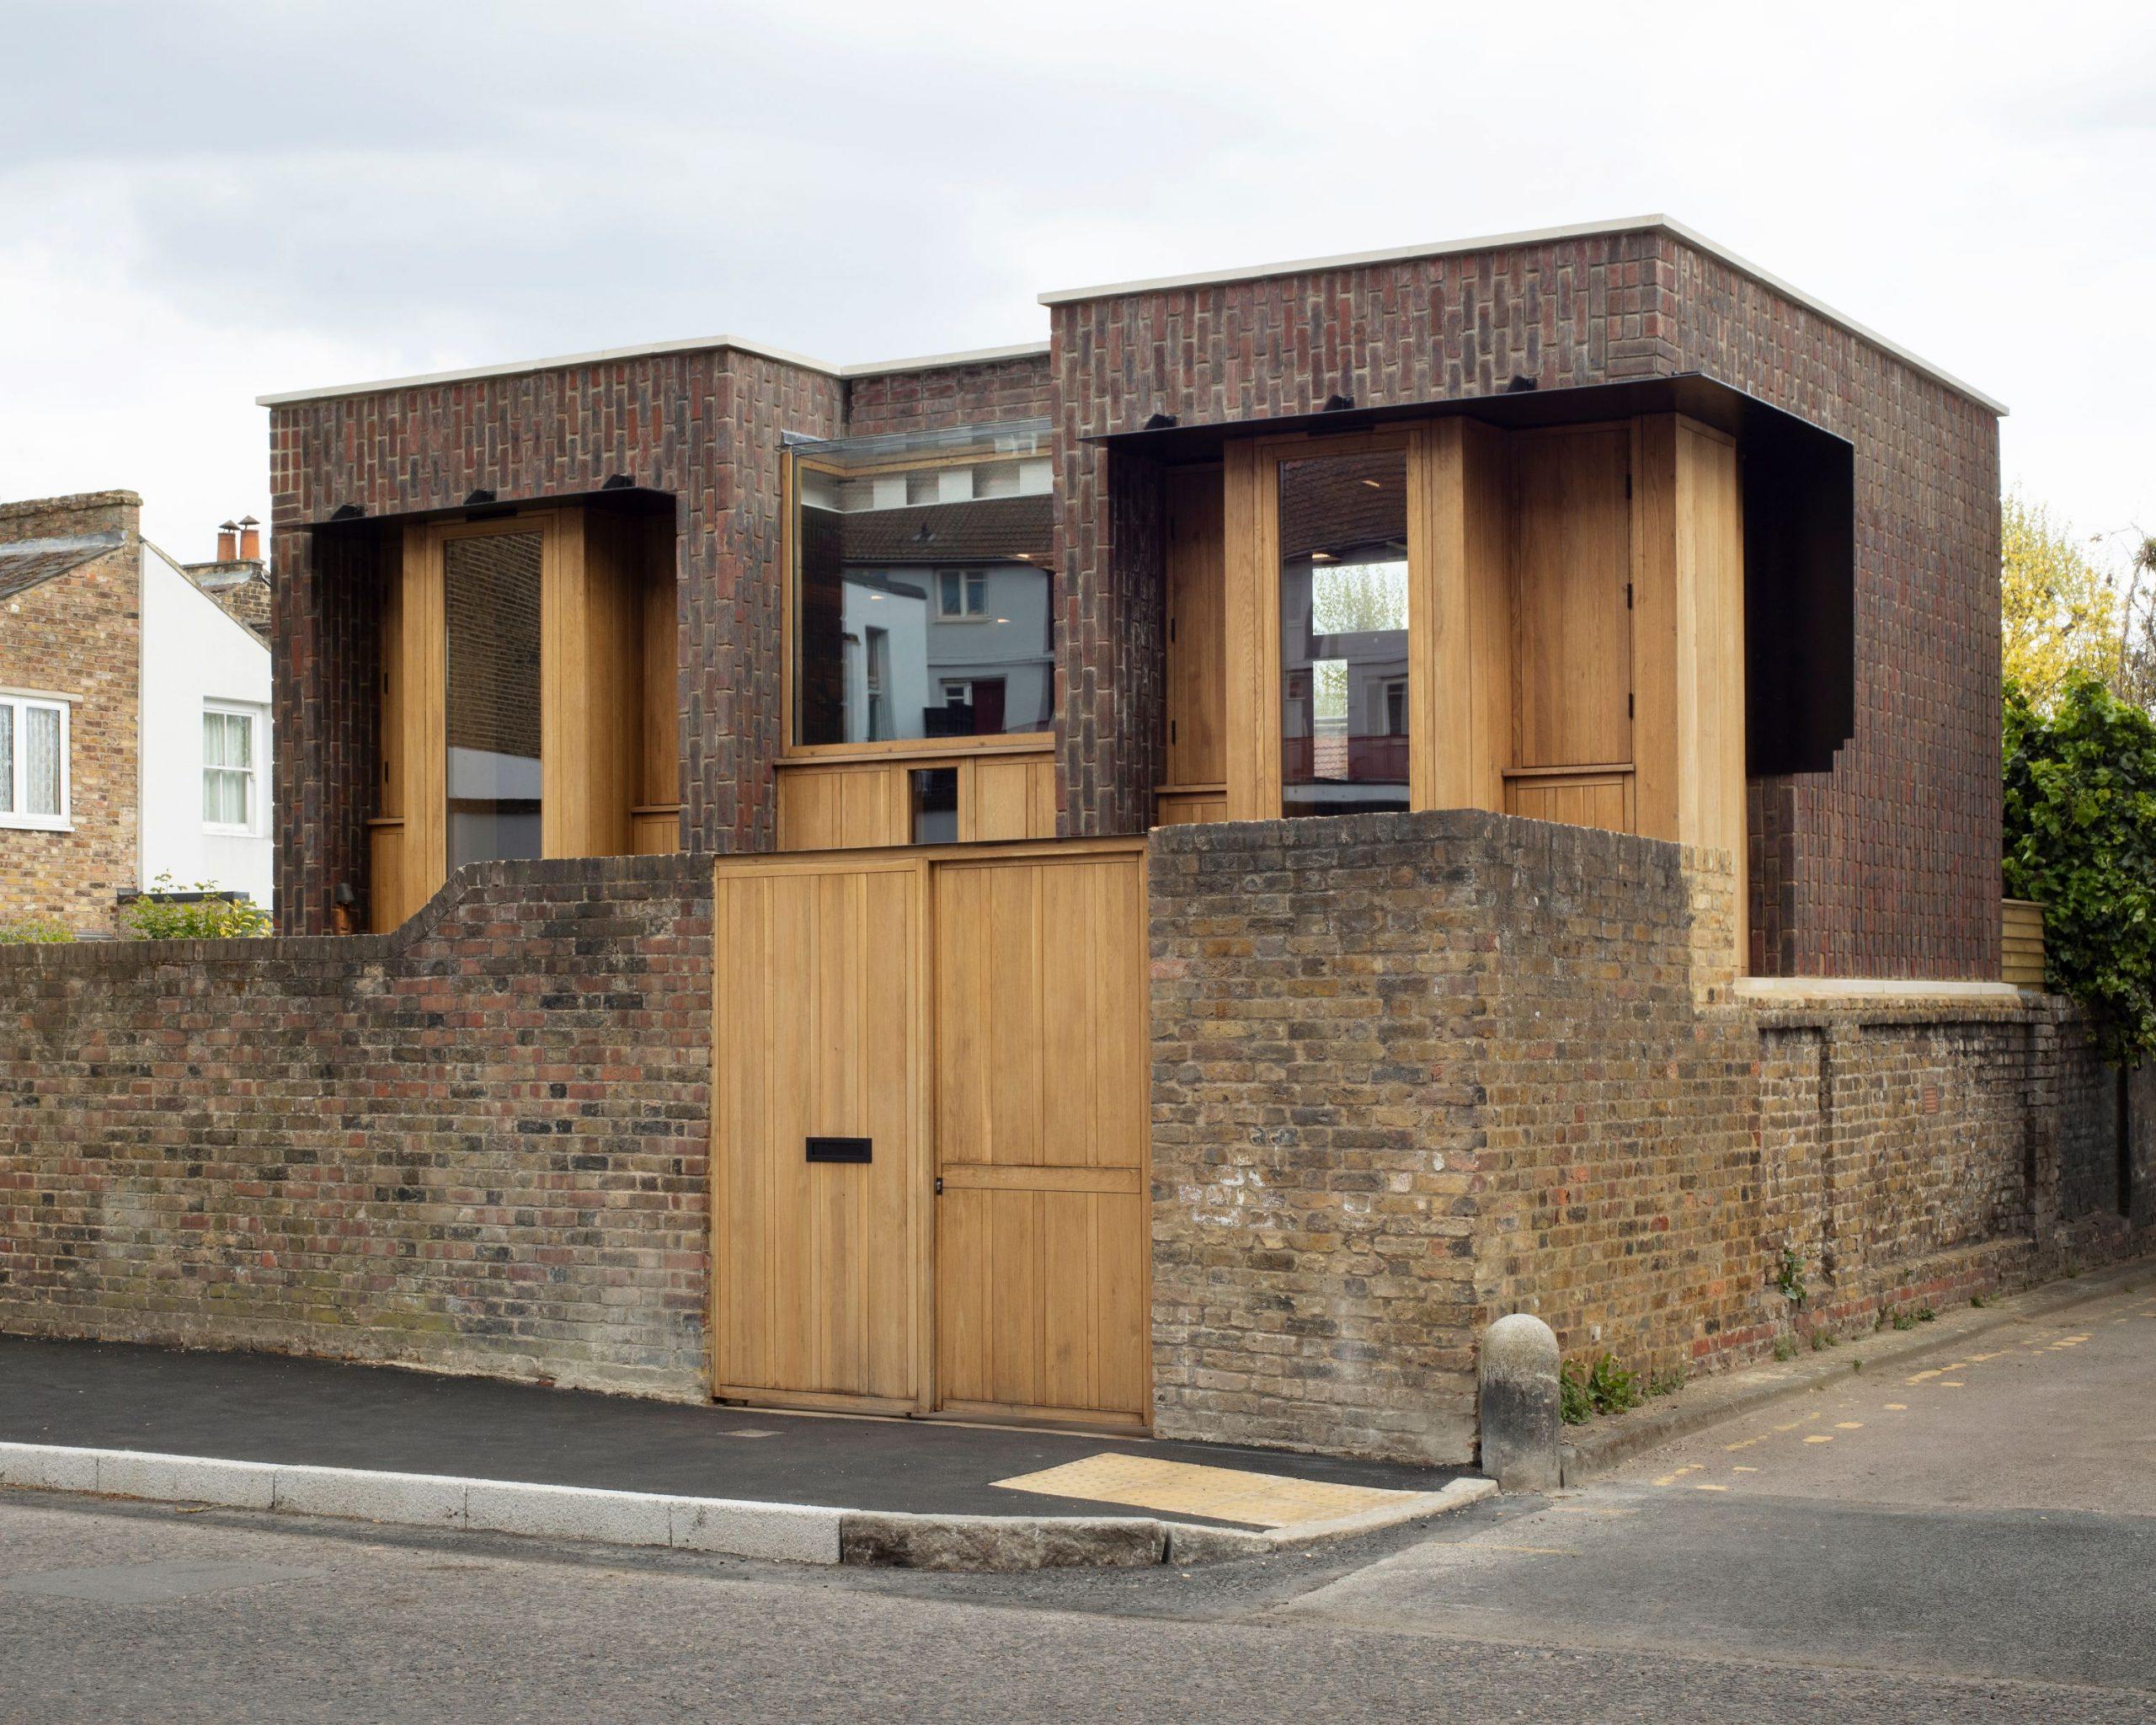 Brick_house7